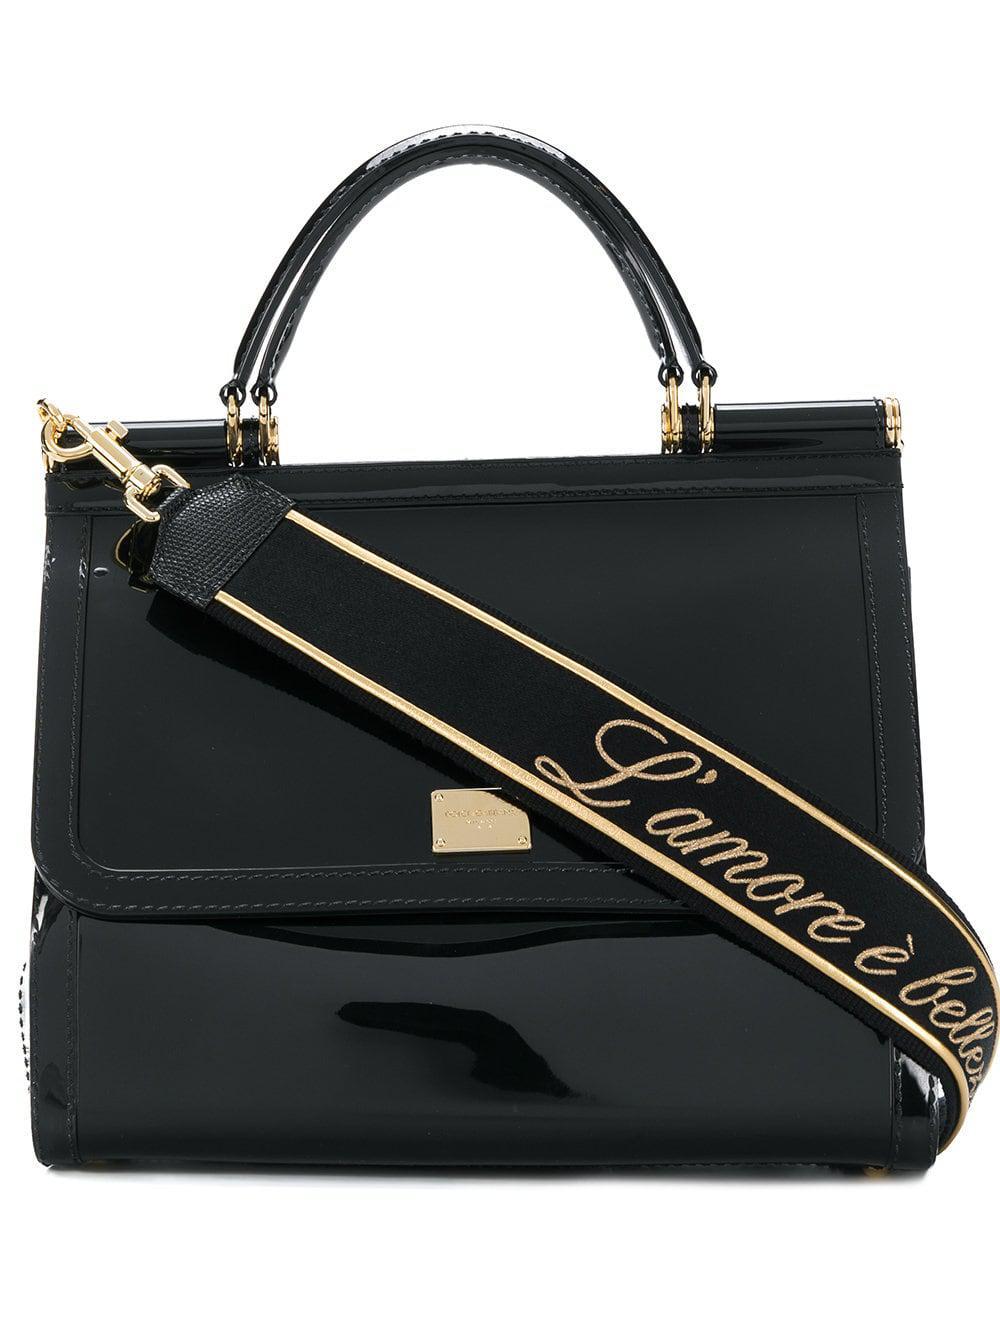 37e3d7d97552 Lyst - Dolce   Gabbana Sicily Rubber Bag in Black - Save 48%